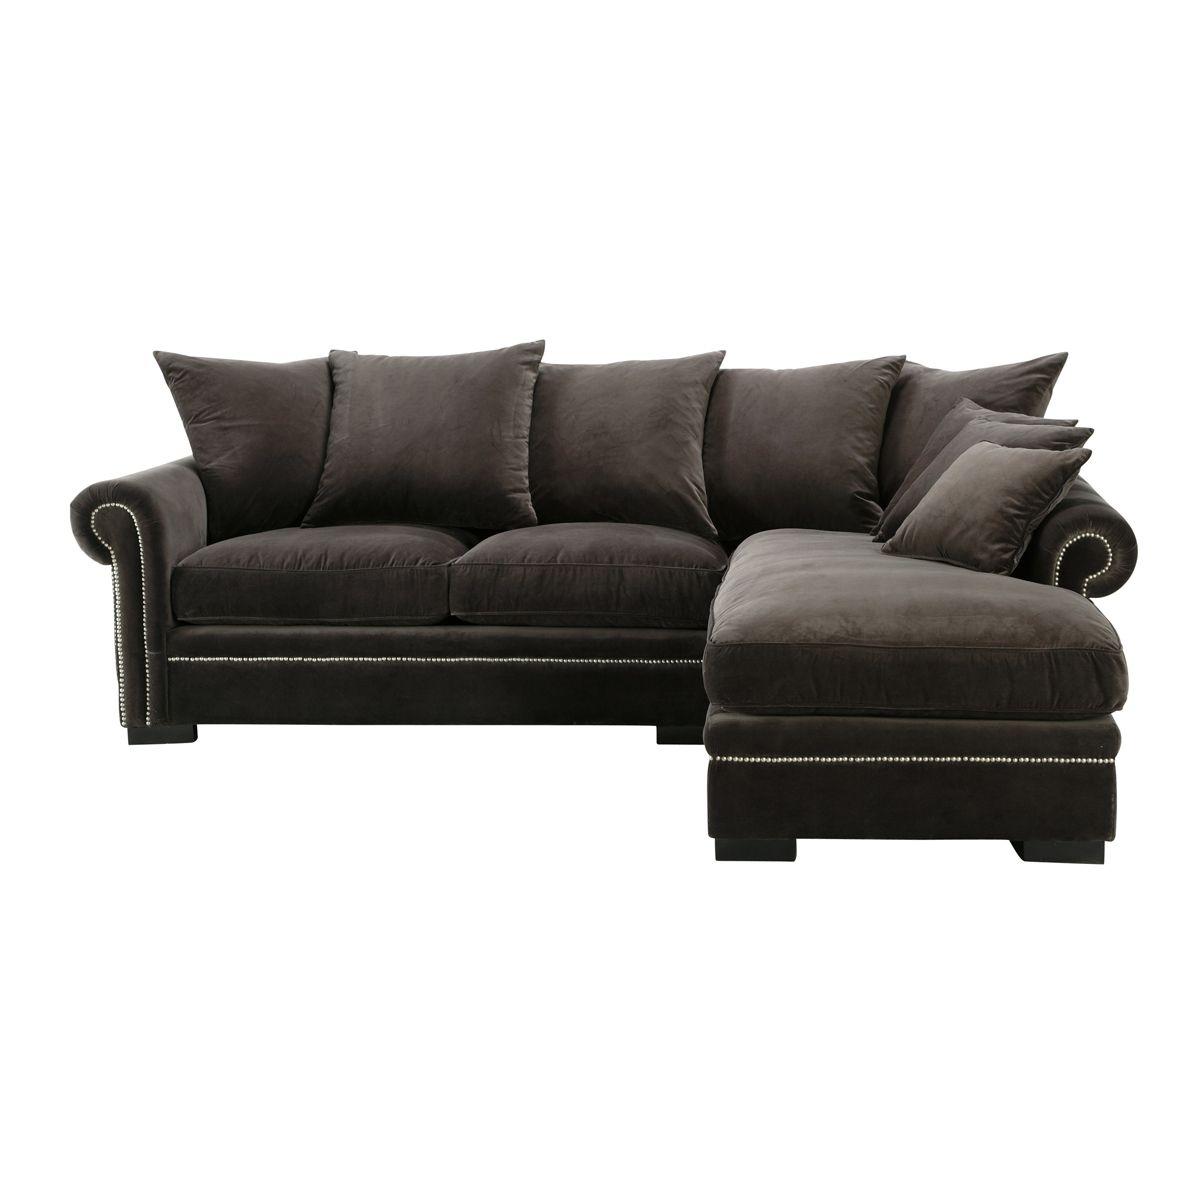 Canapé Moelleux Assise Profonde canapés d'angle   velvet corner sofa, corner sofa, grey